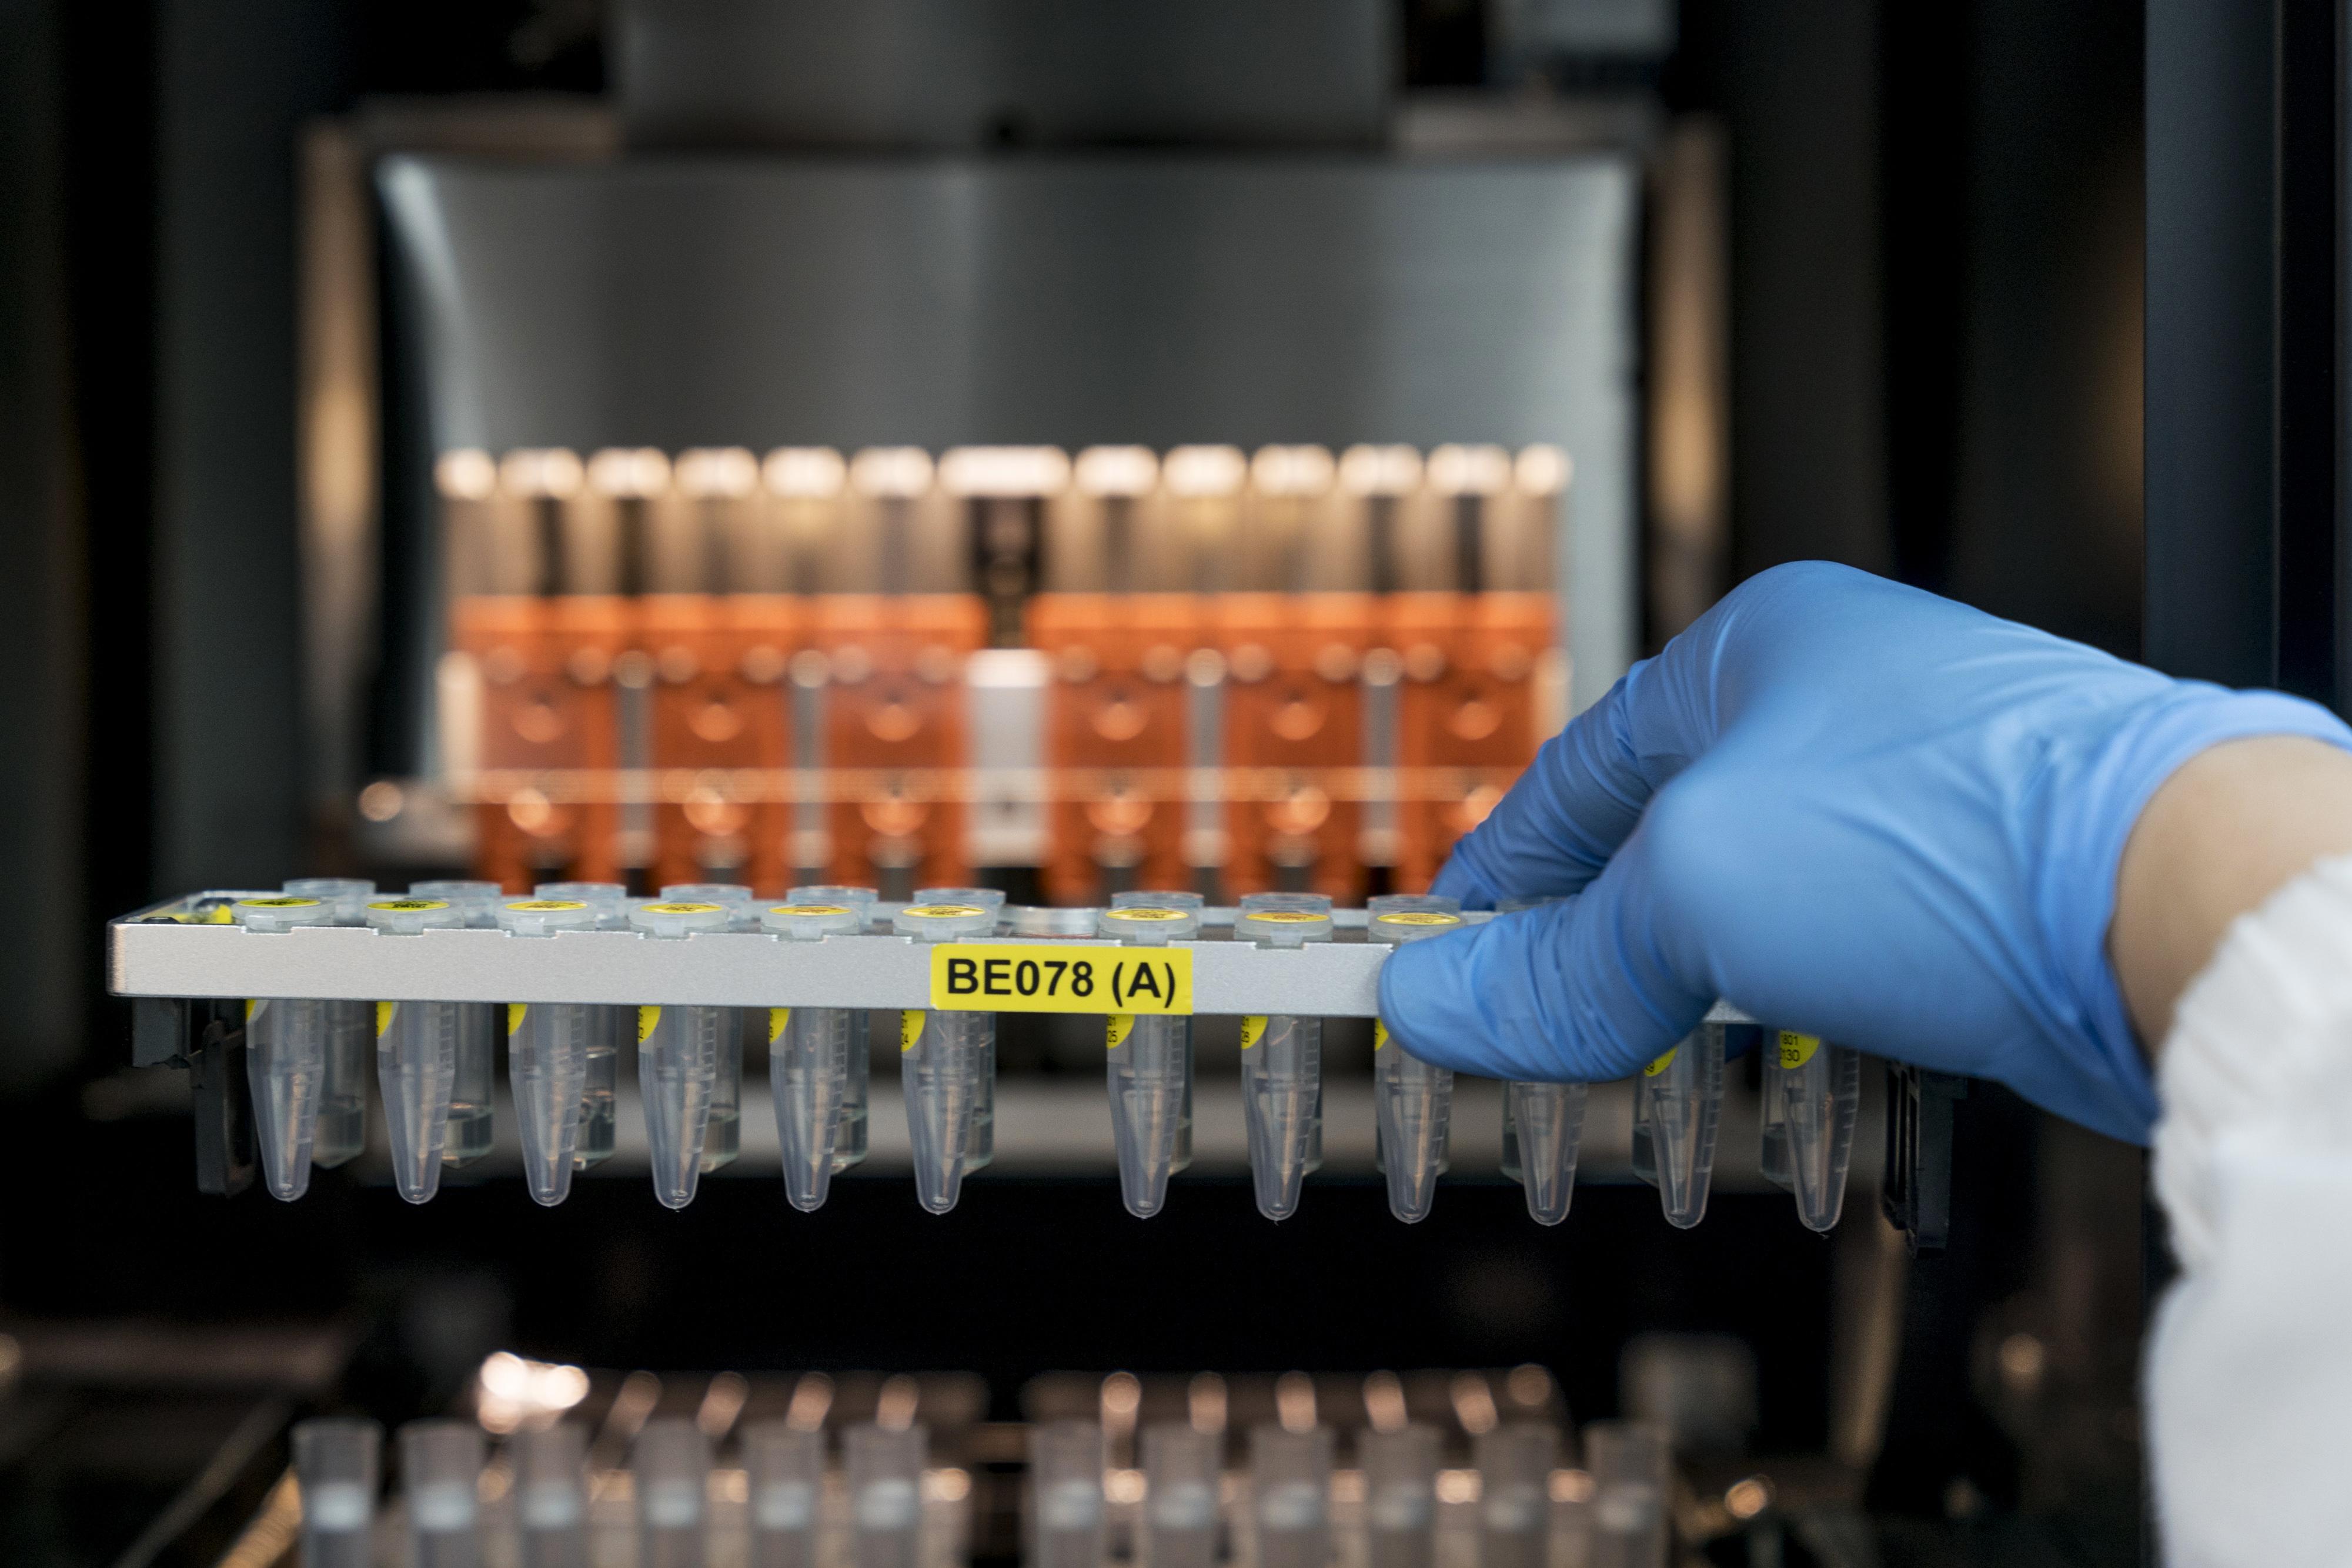 Inside Prenetics DNA Testing Lab